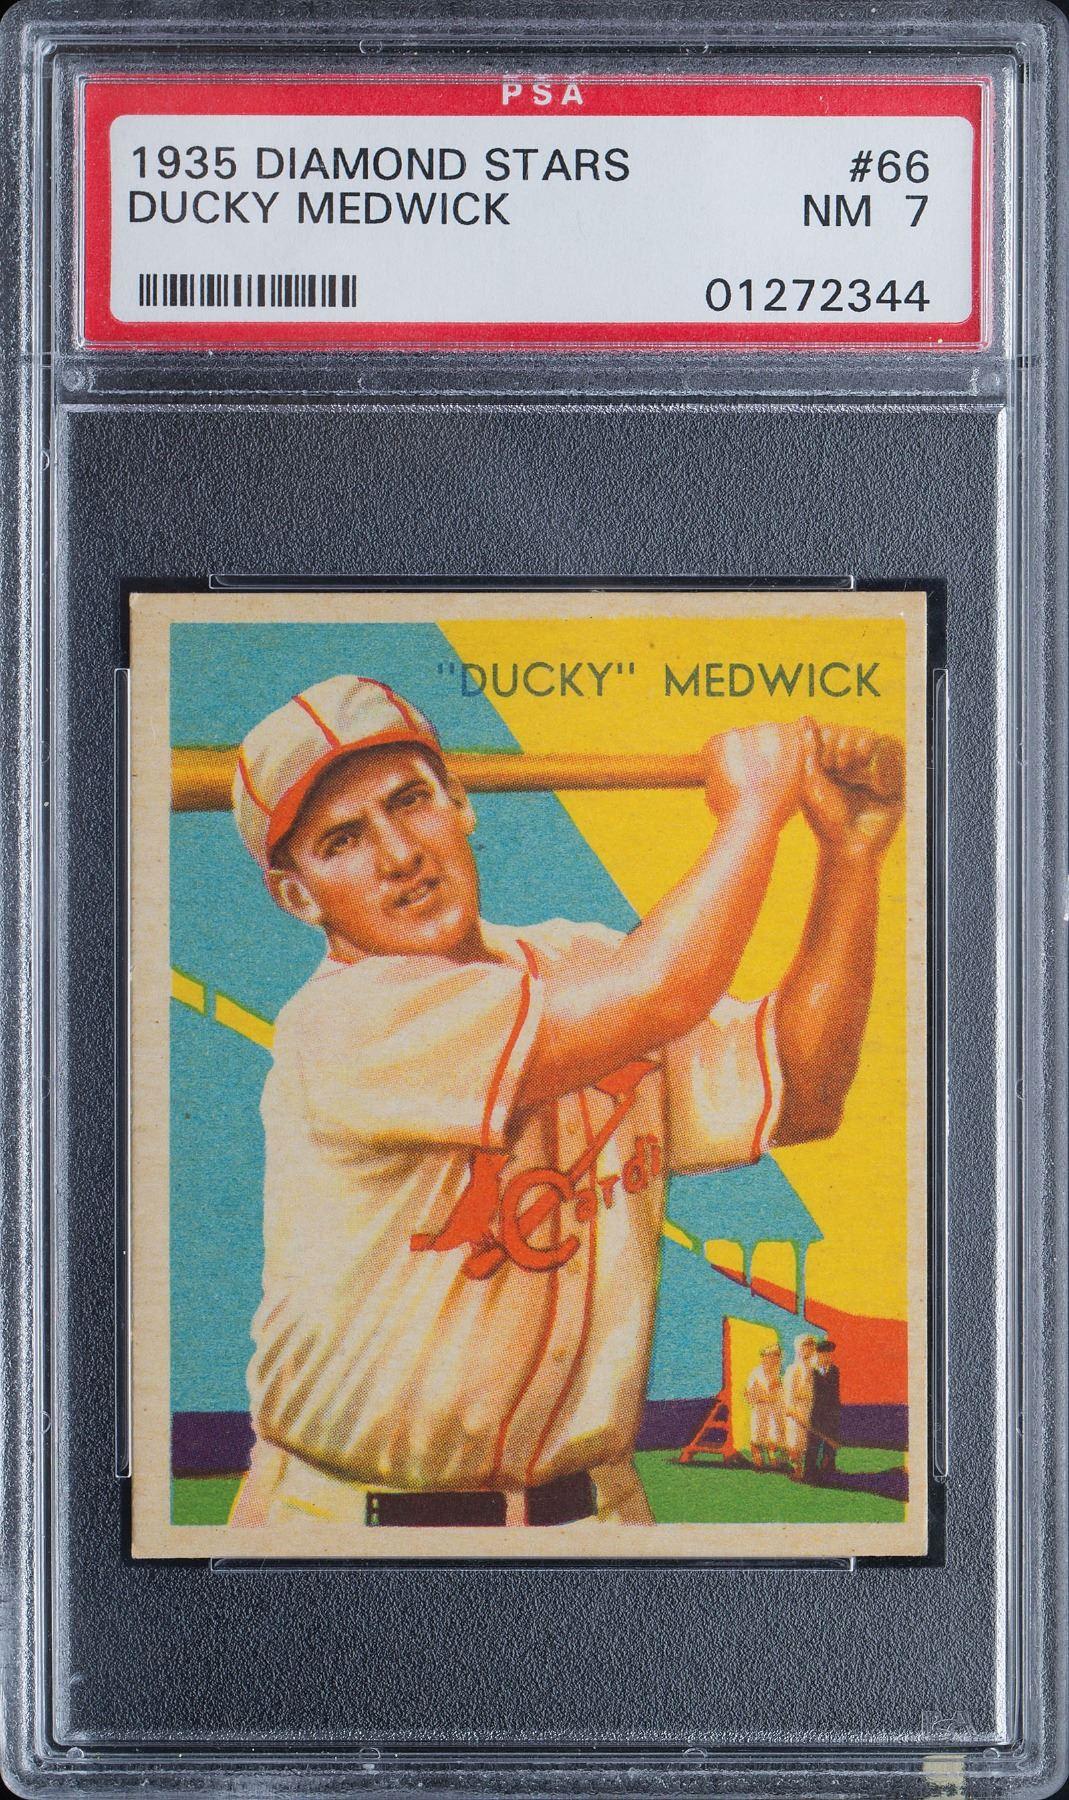 1935 Diamond Stars 66 Ducky Medwick Psa Nm 7